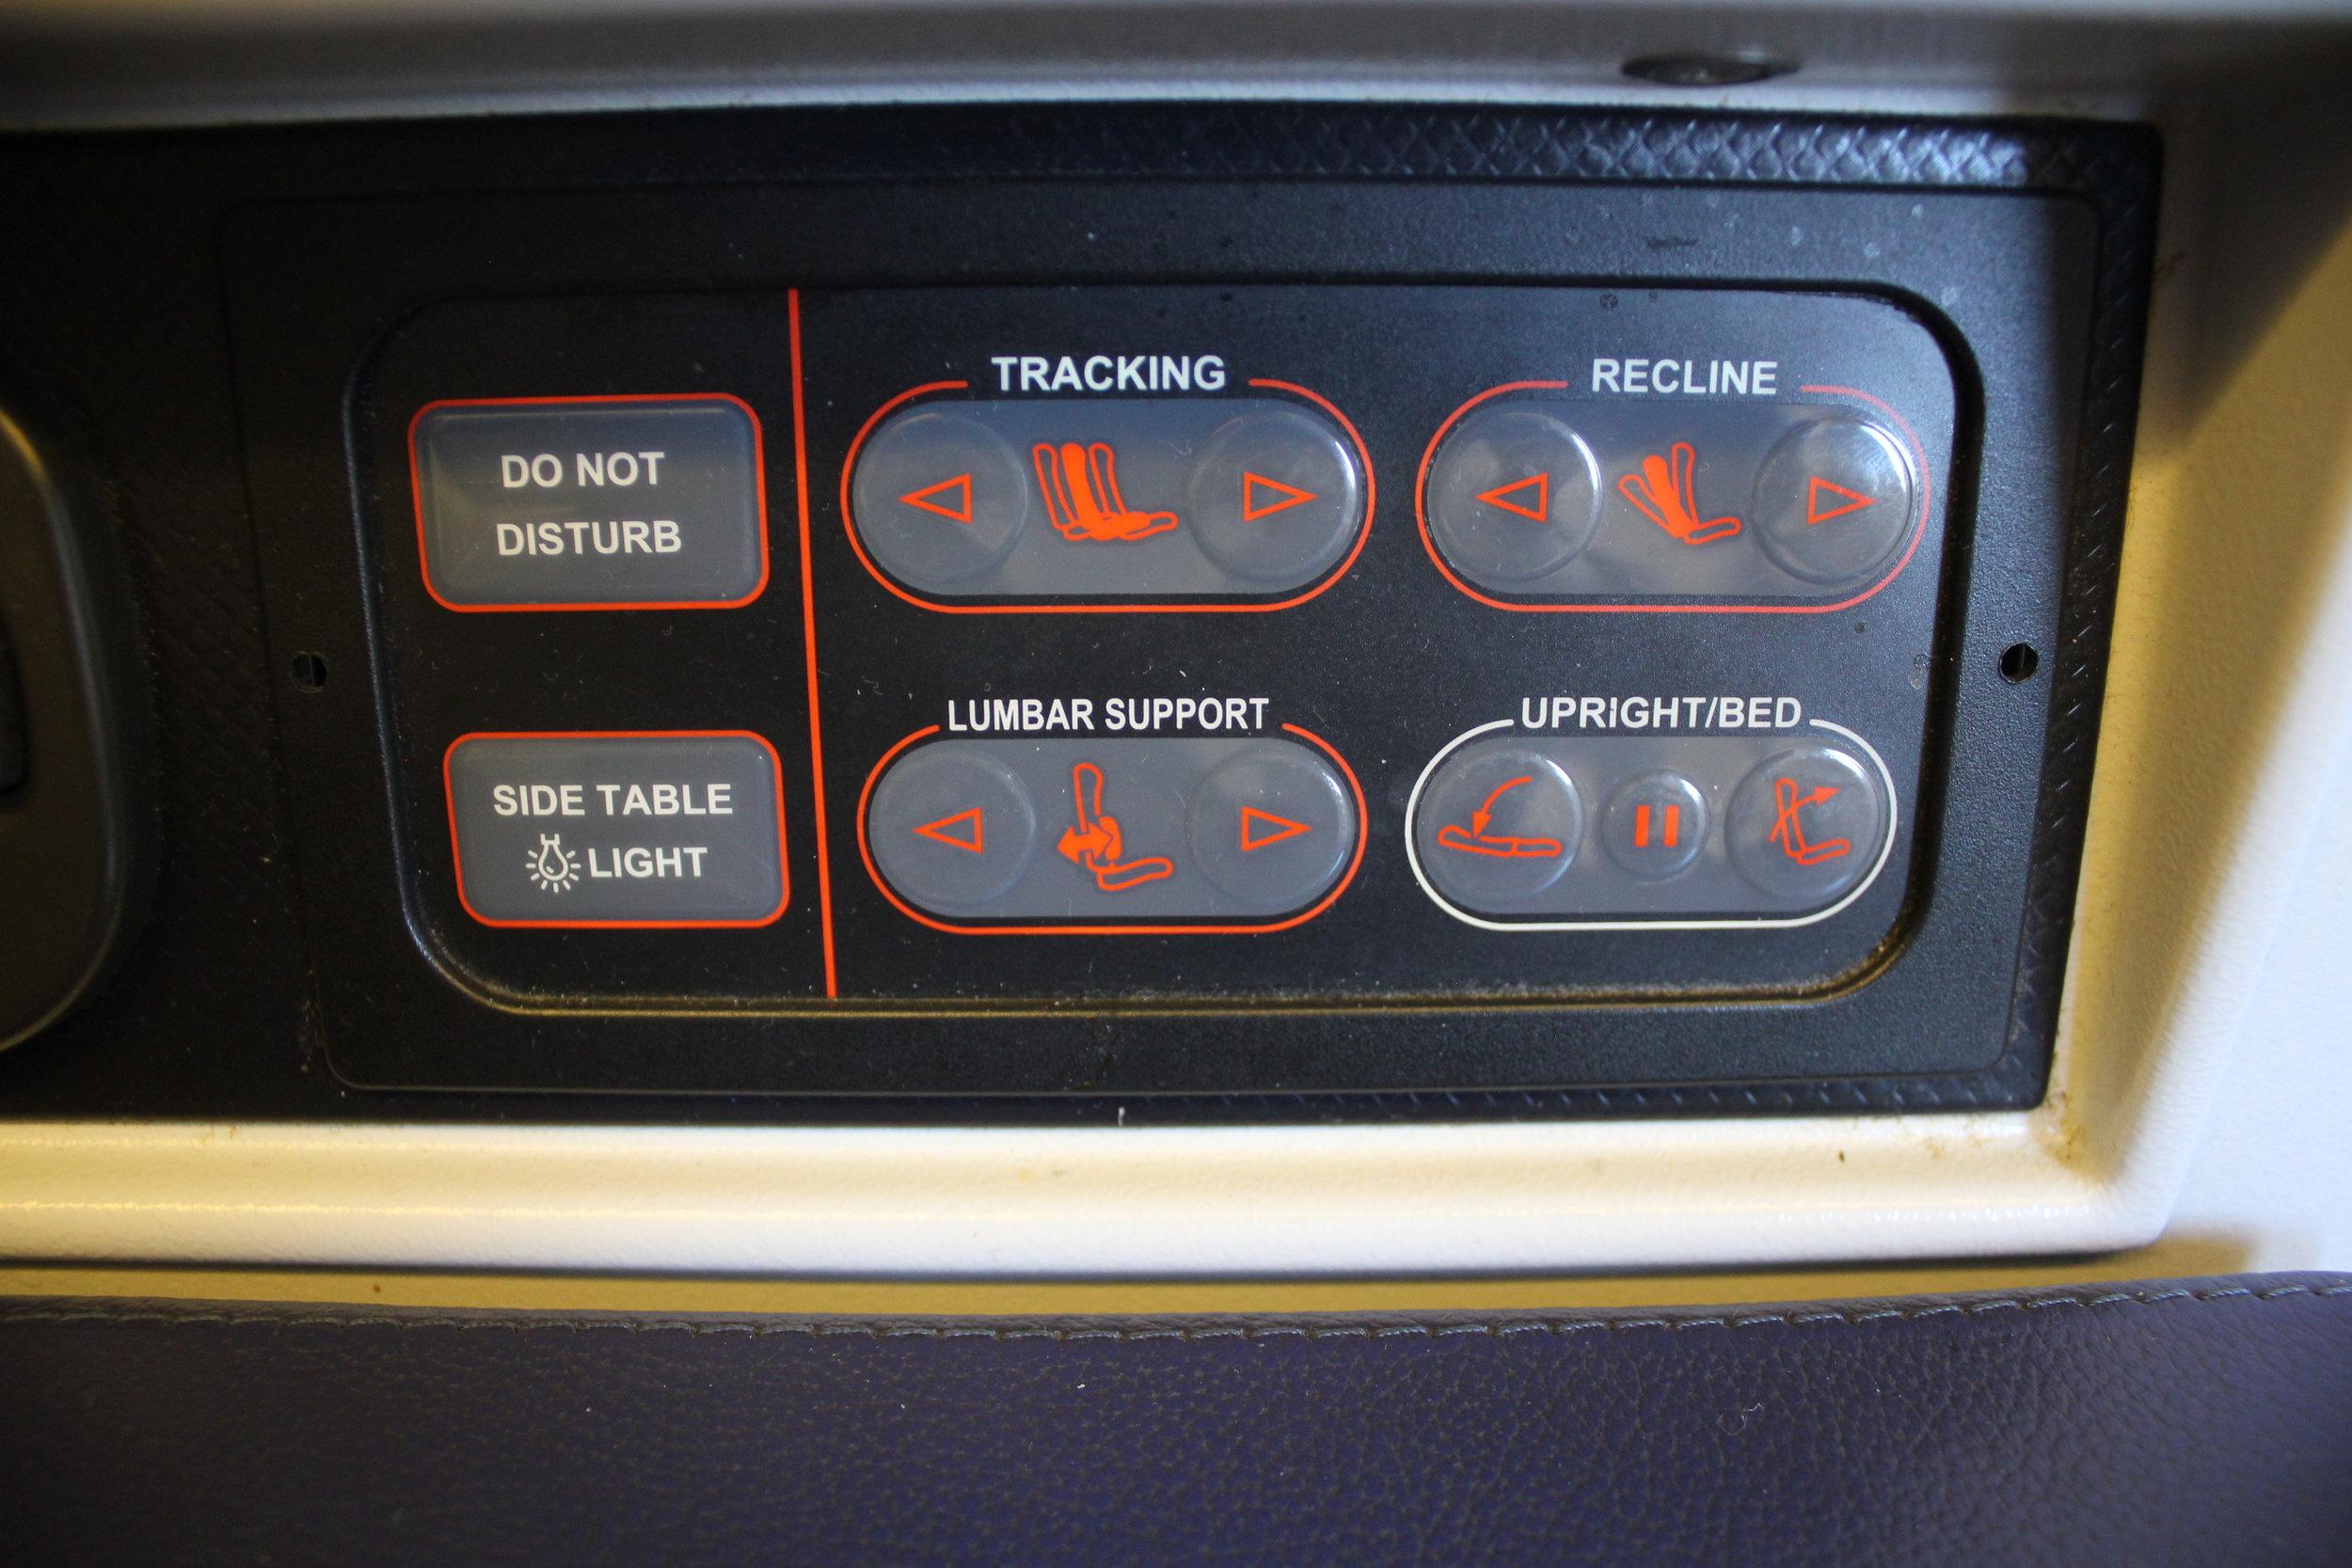 ANA 777 business class – Seat controls